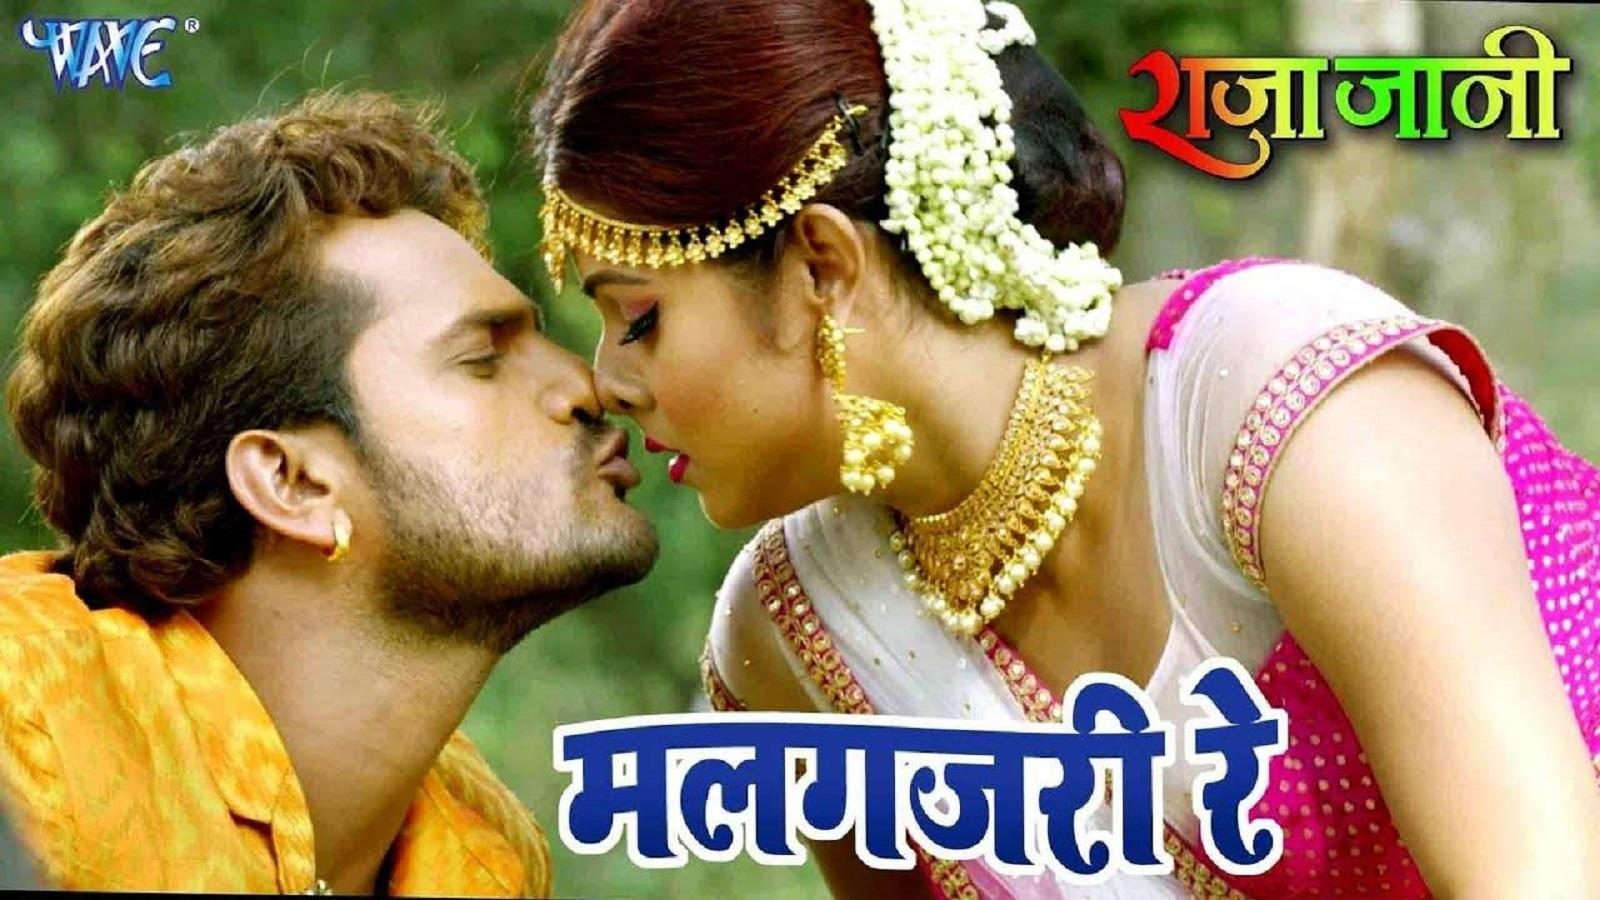 Khesari or Priti Ka Bhojpuri Gana Video Song: Bhojpuri Song DJ Remix Video  'Malgajari Re' from 'Raja Jani' Ft. Khesari Lal Yadav and Priti Biswas